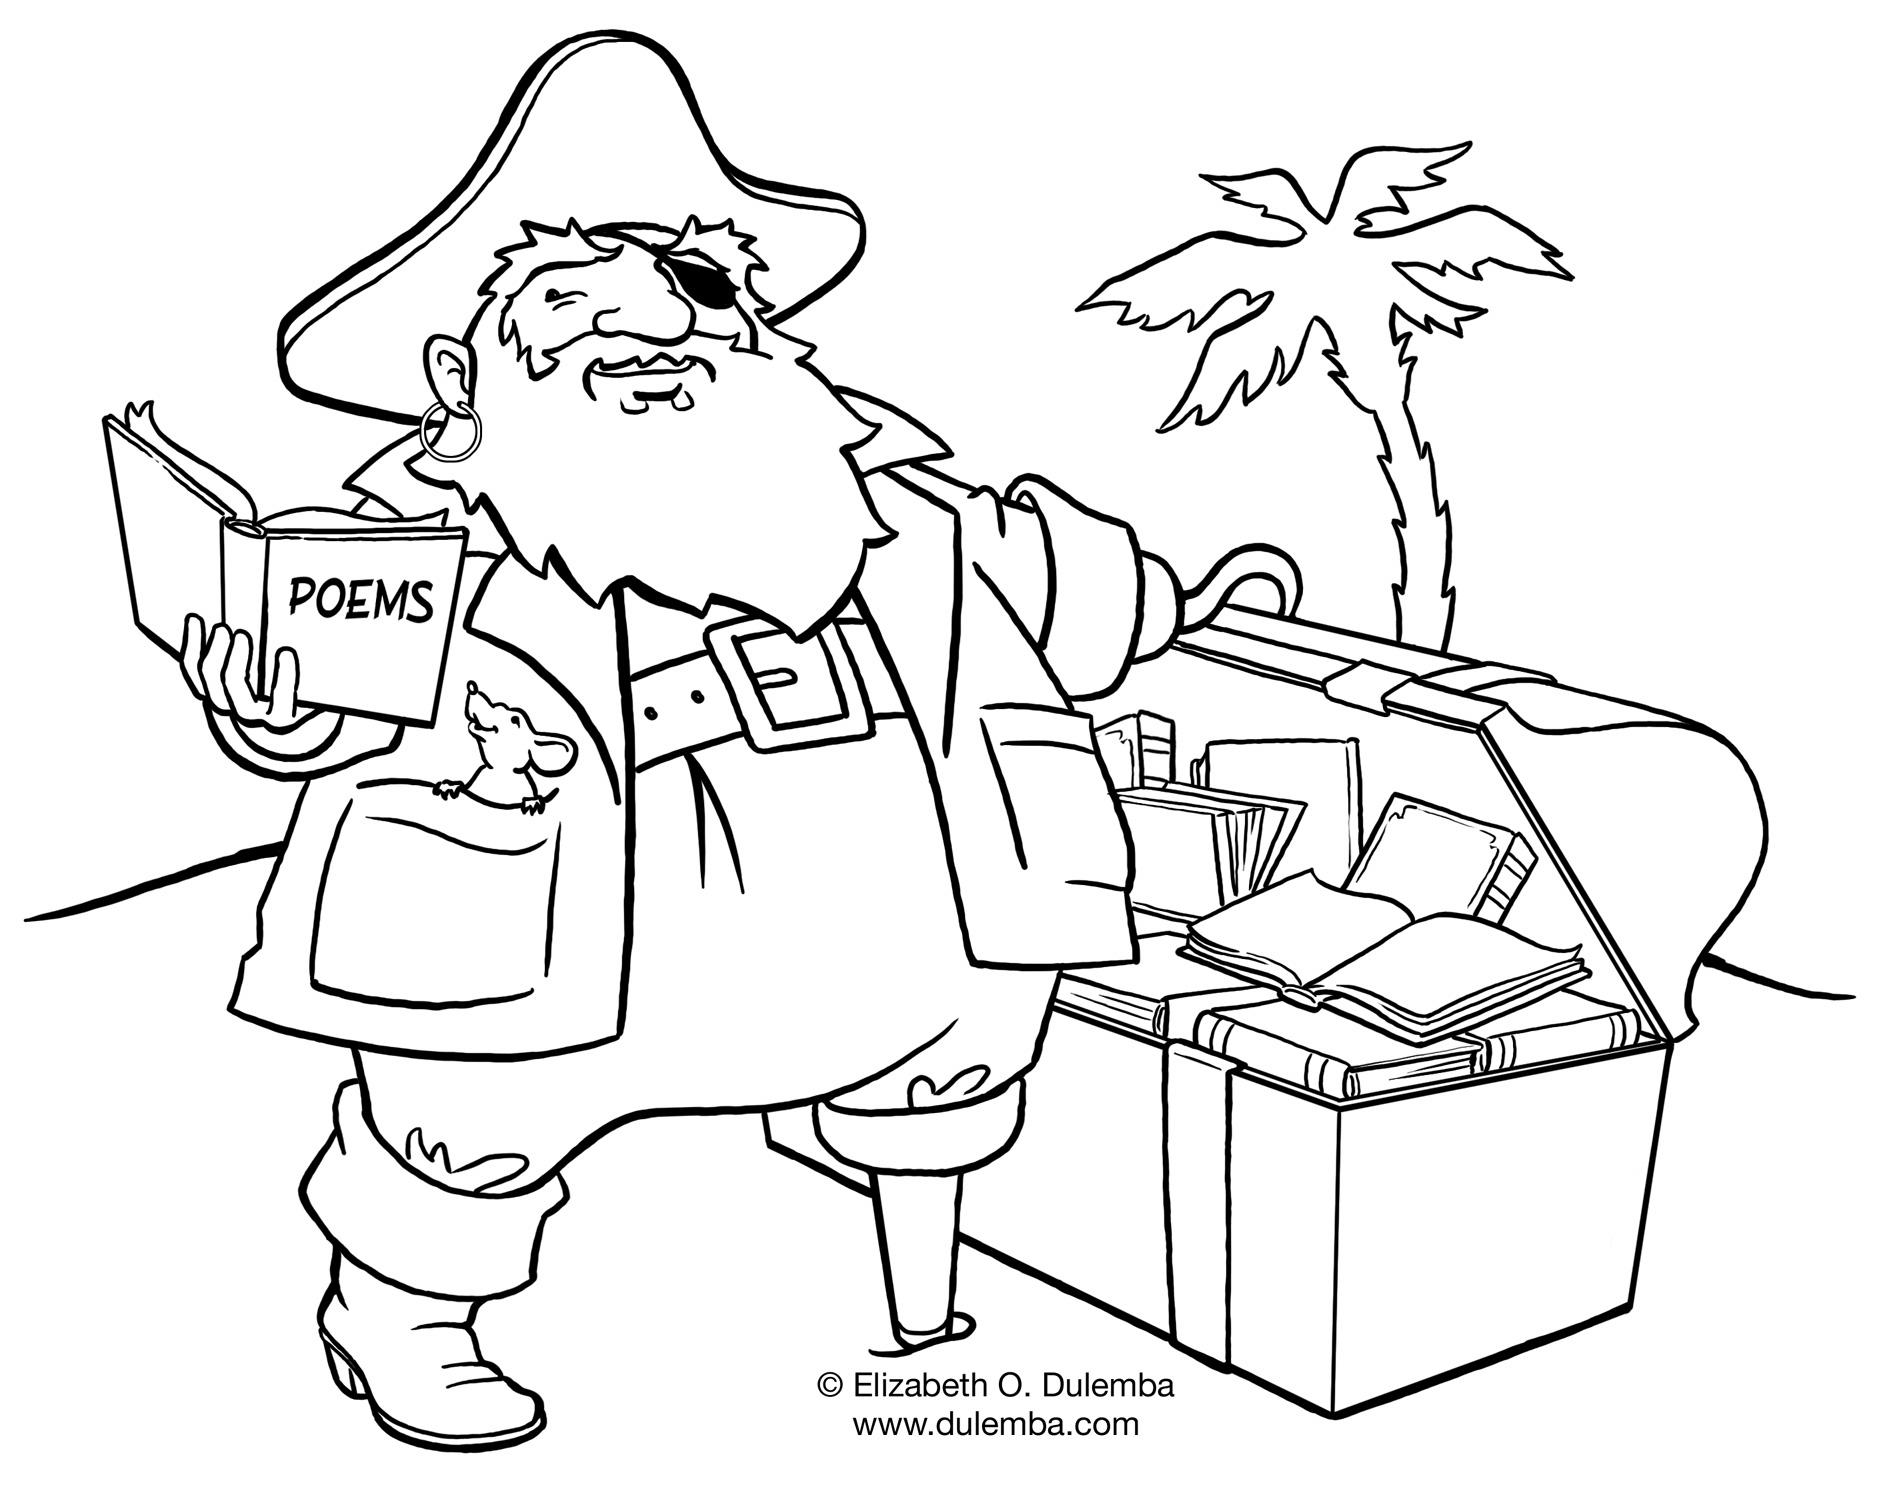 Book Piracy: A Non-Issue